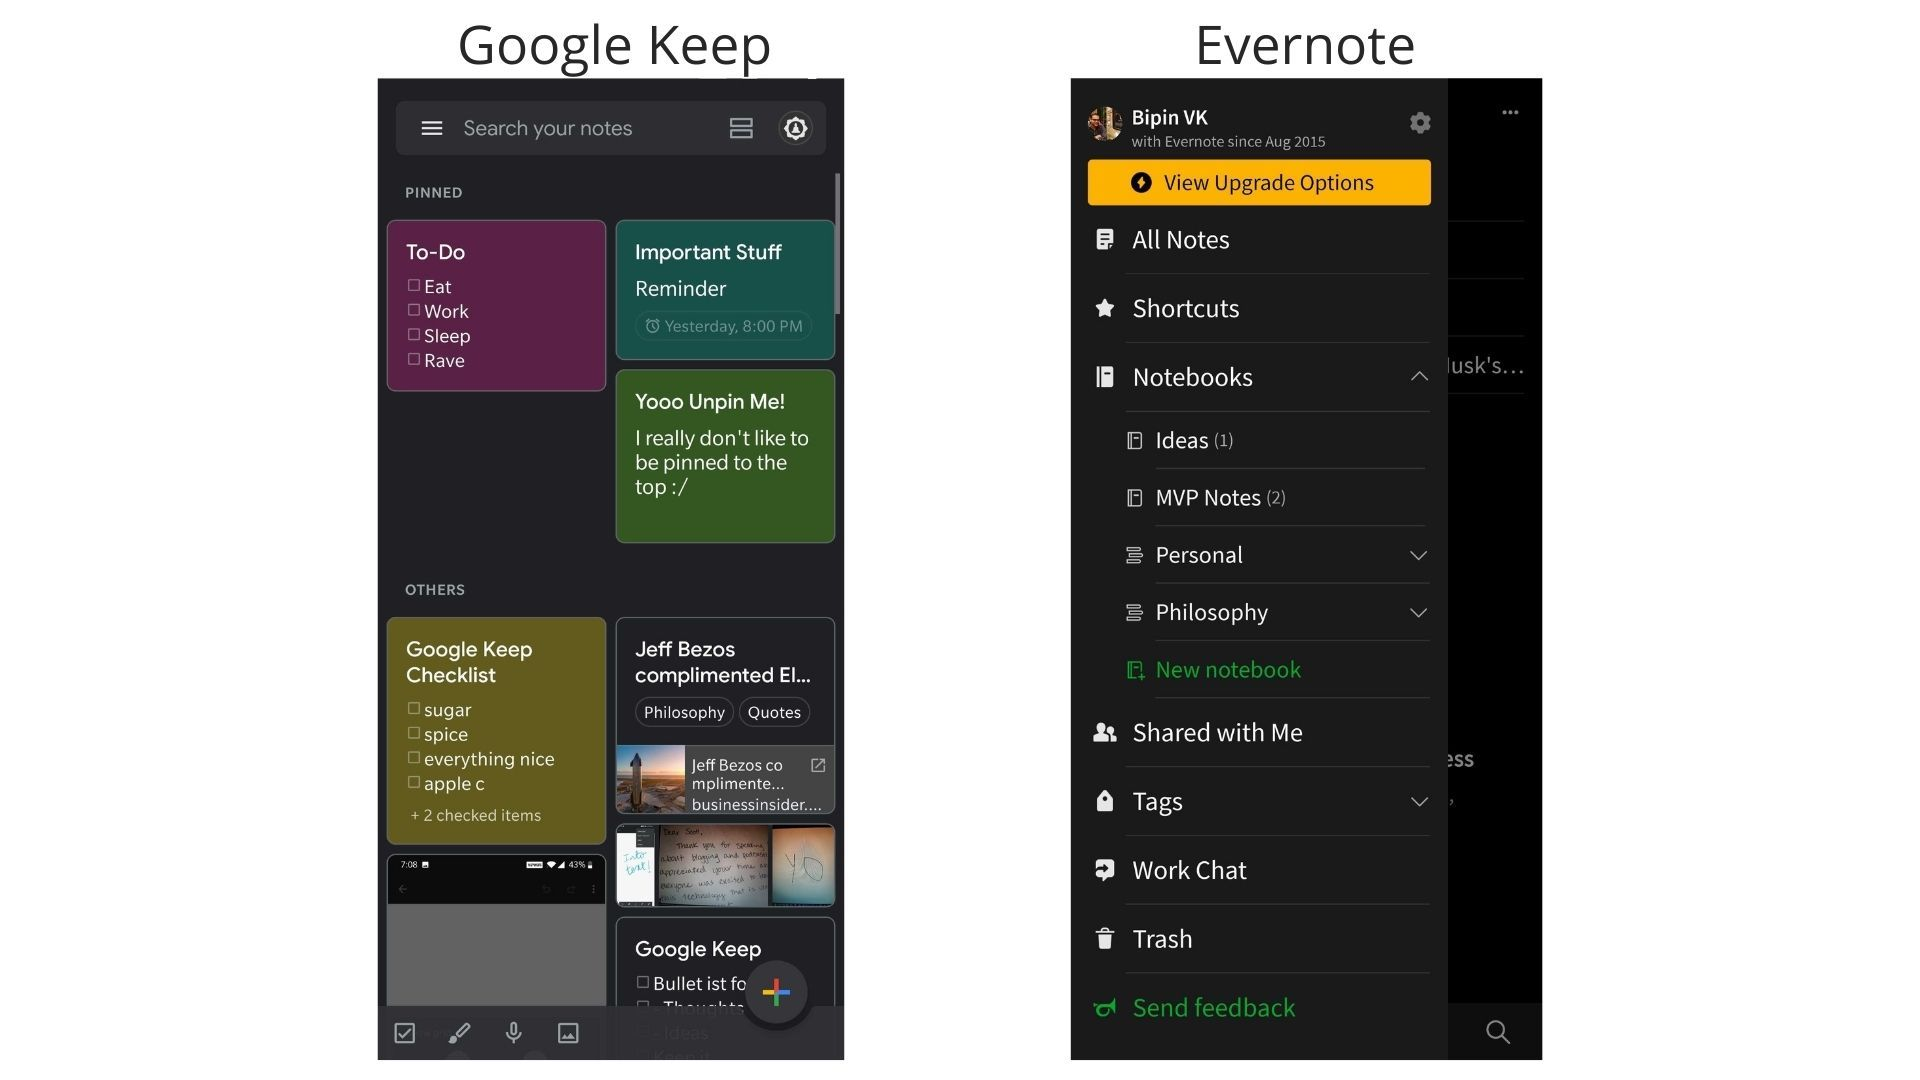 Sample organization on Google Keep and Evernote